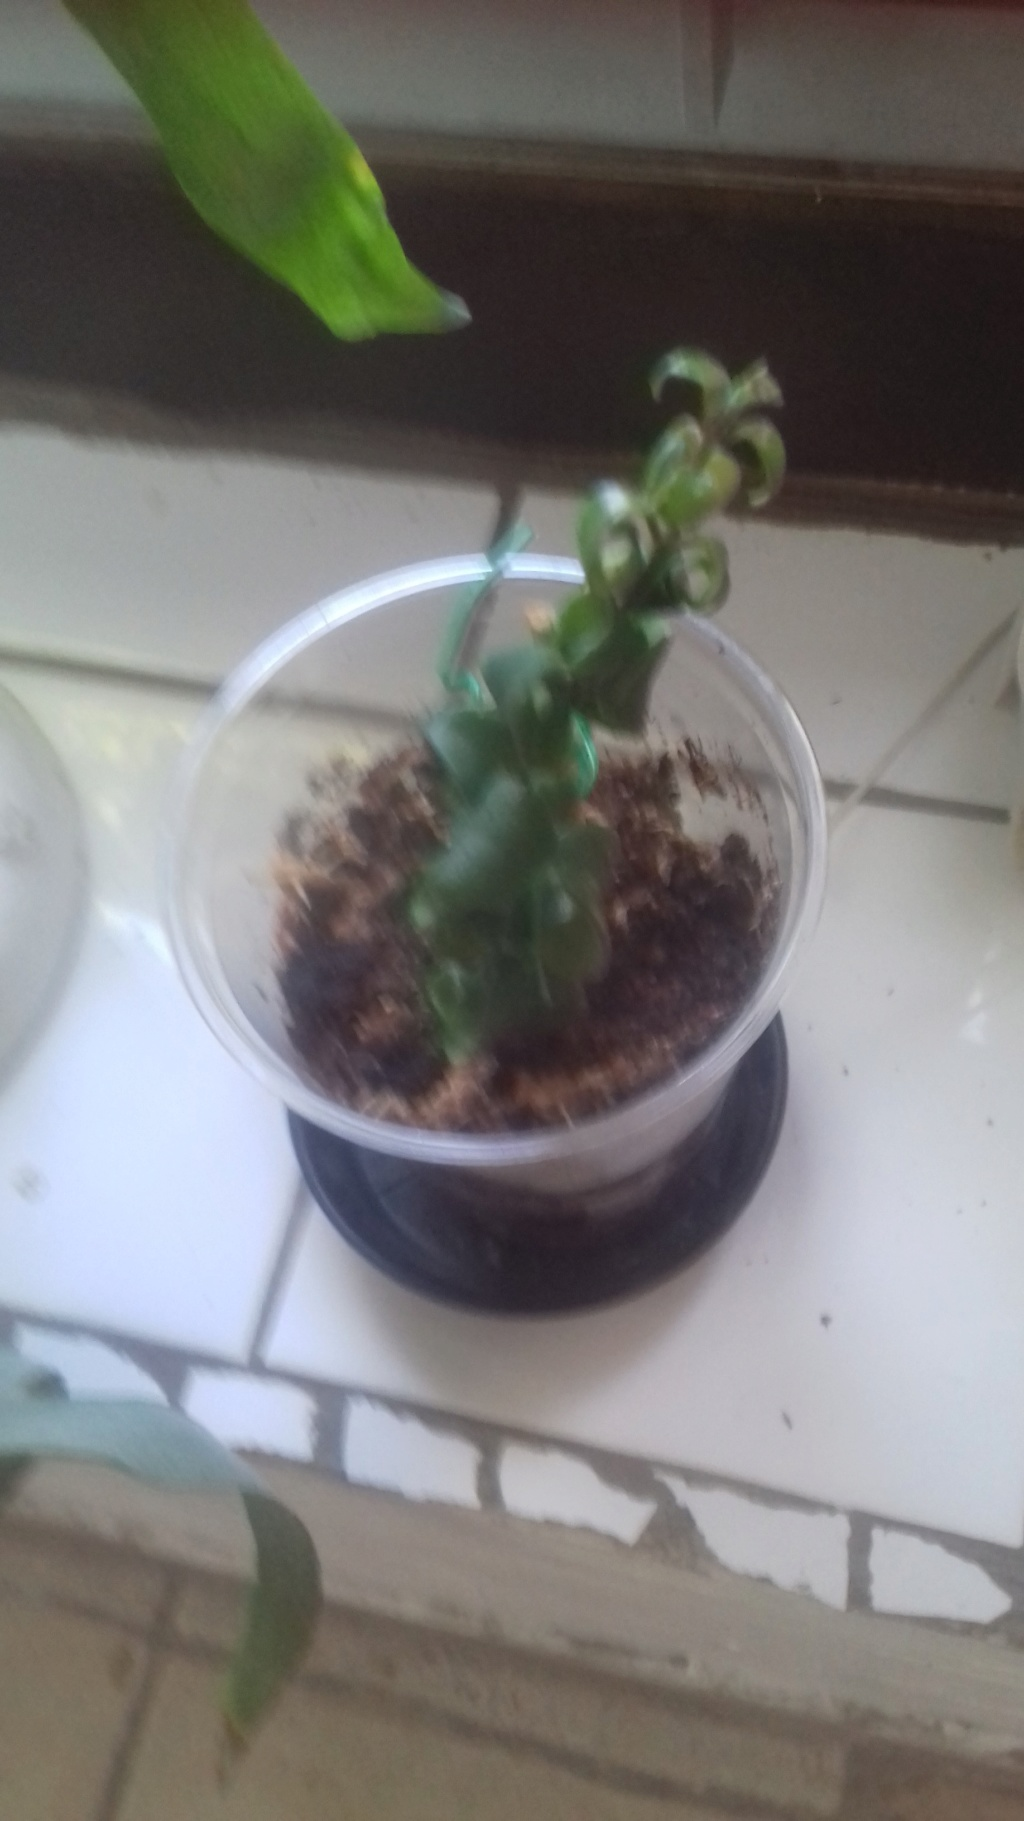 Mes plantes dans la véranda - Page 10 00643